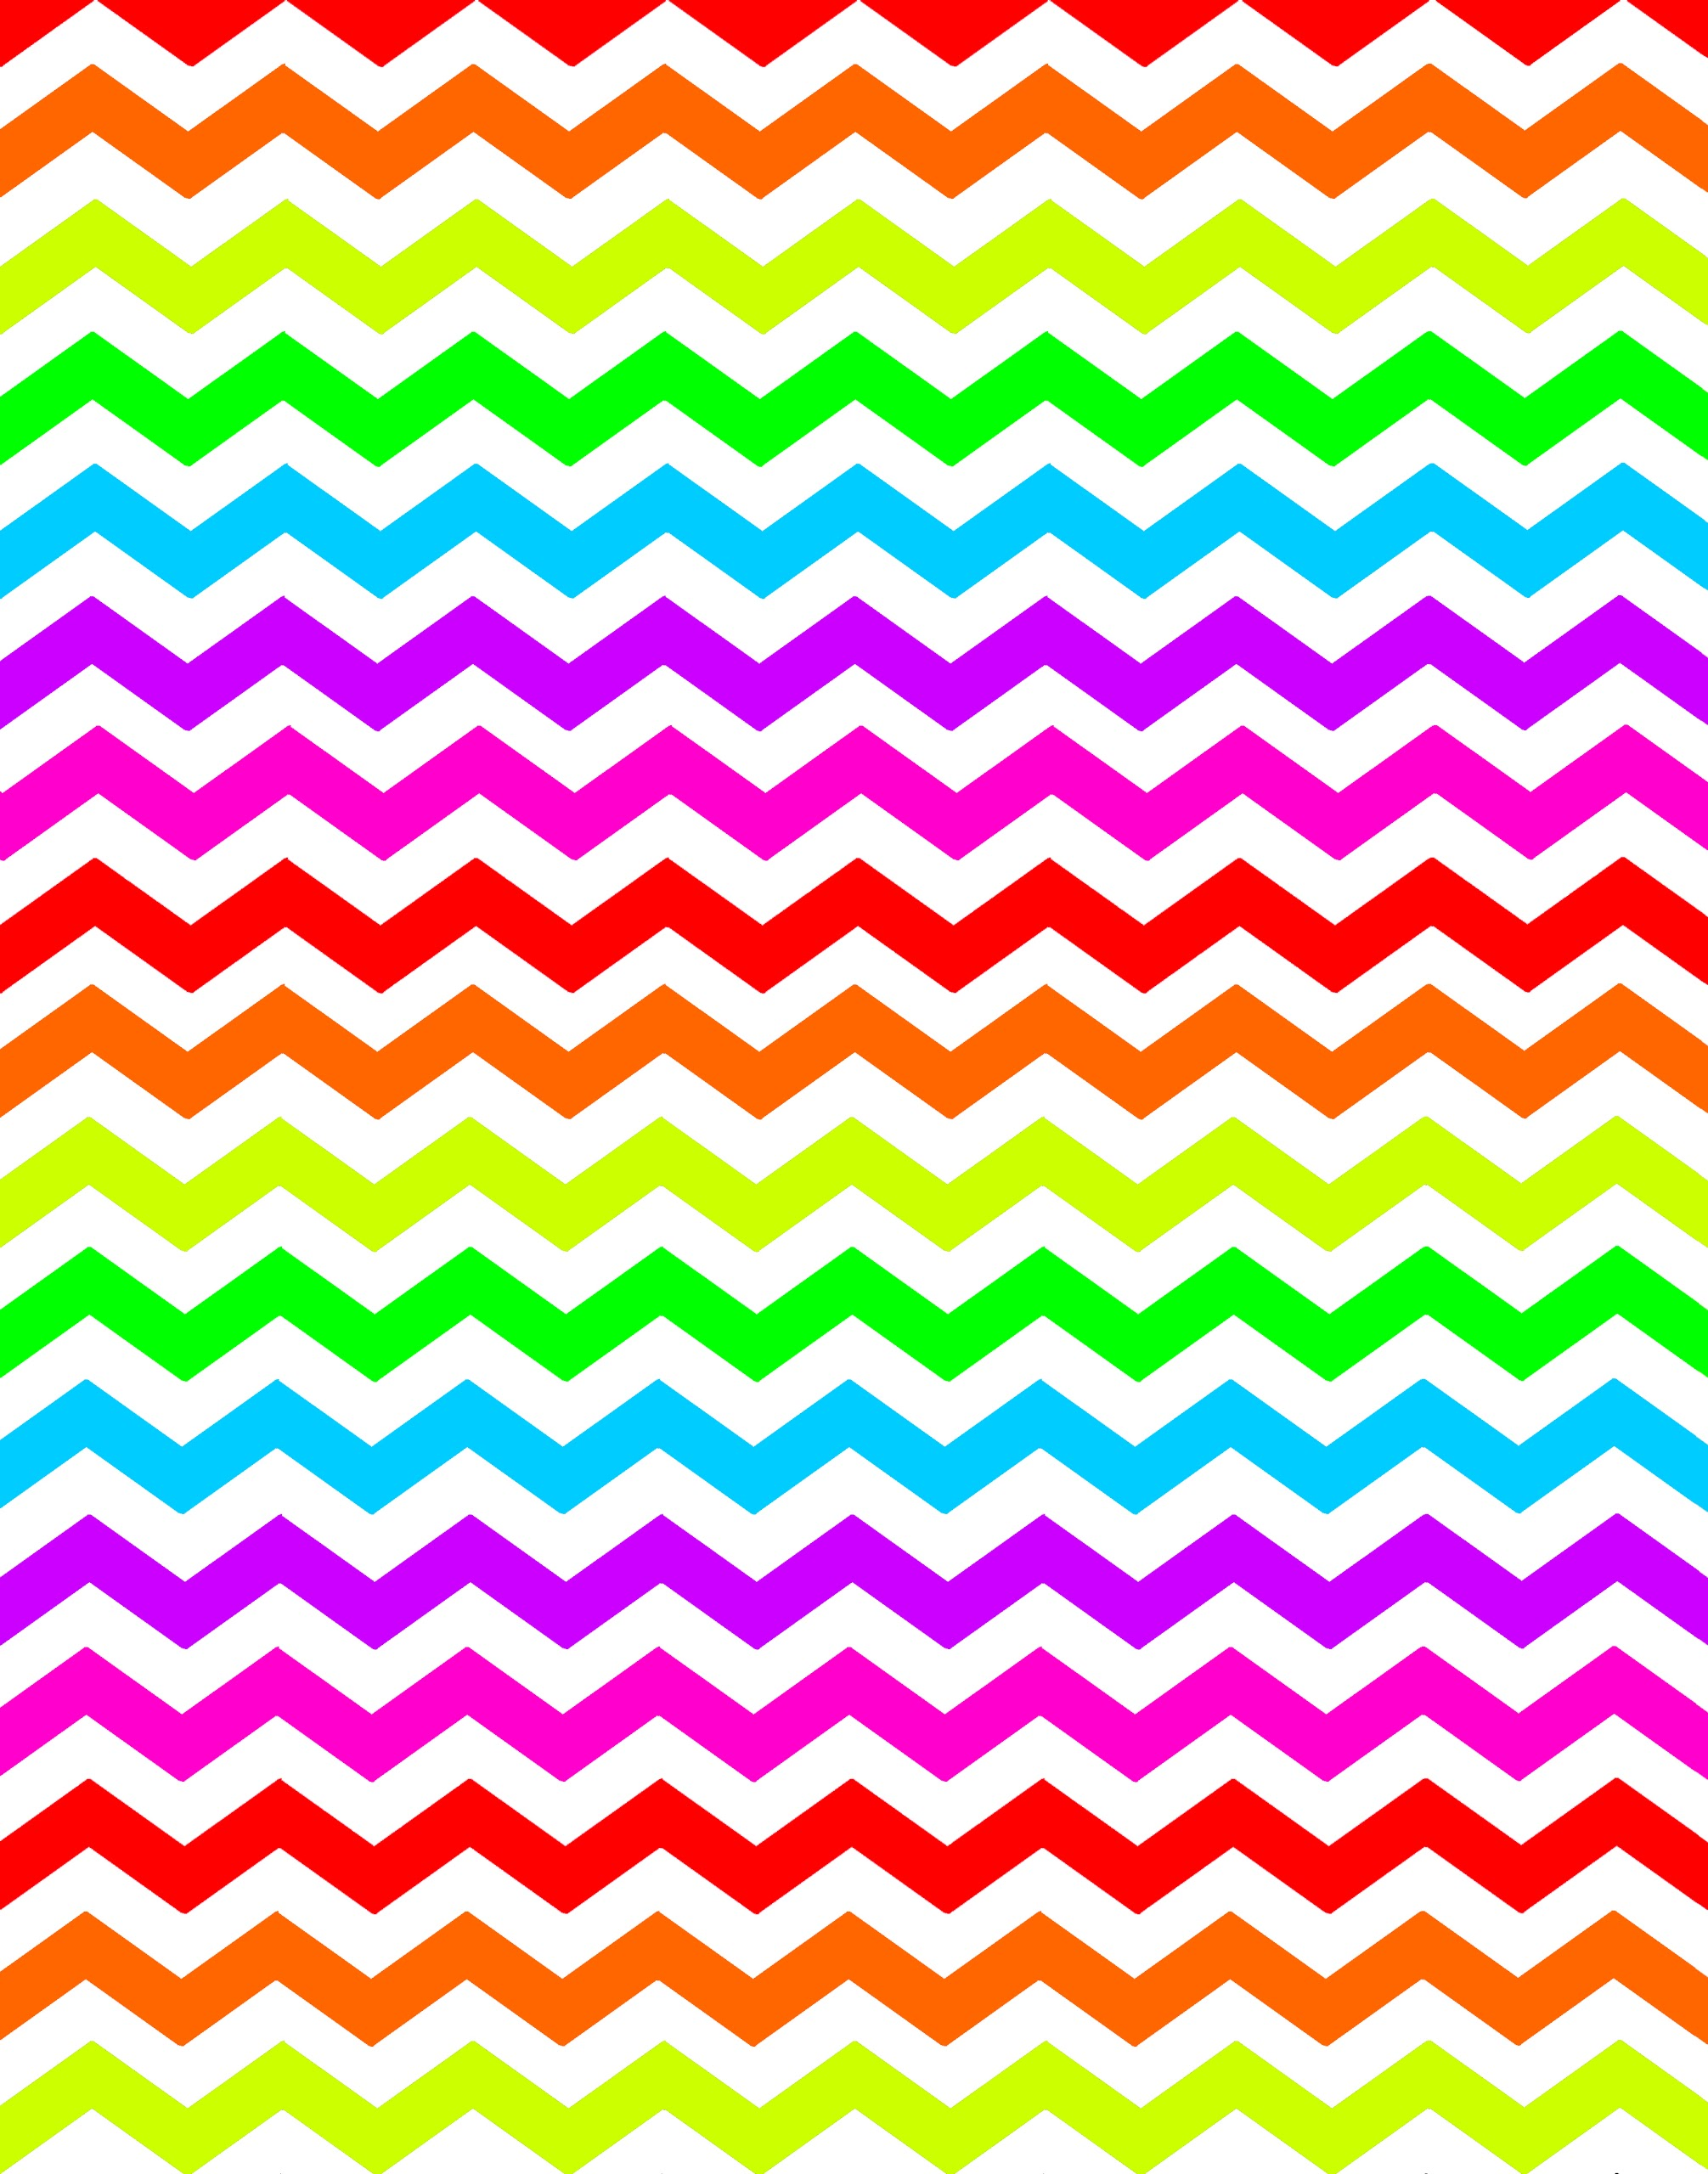 Multi colored zebra print wallpapers